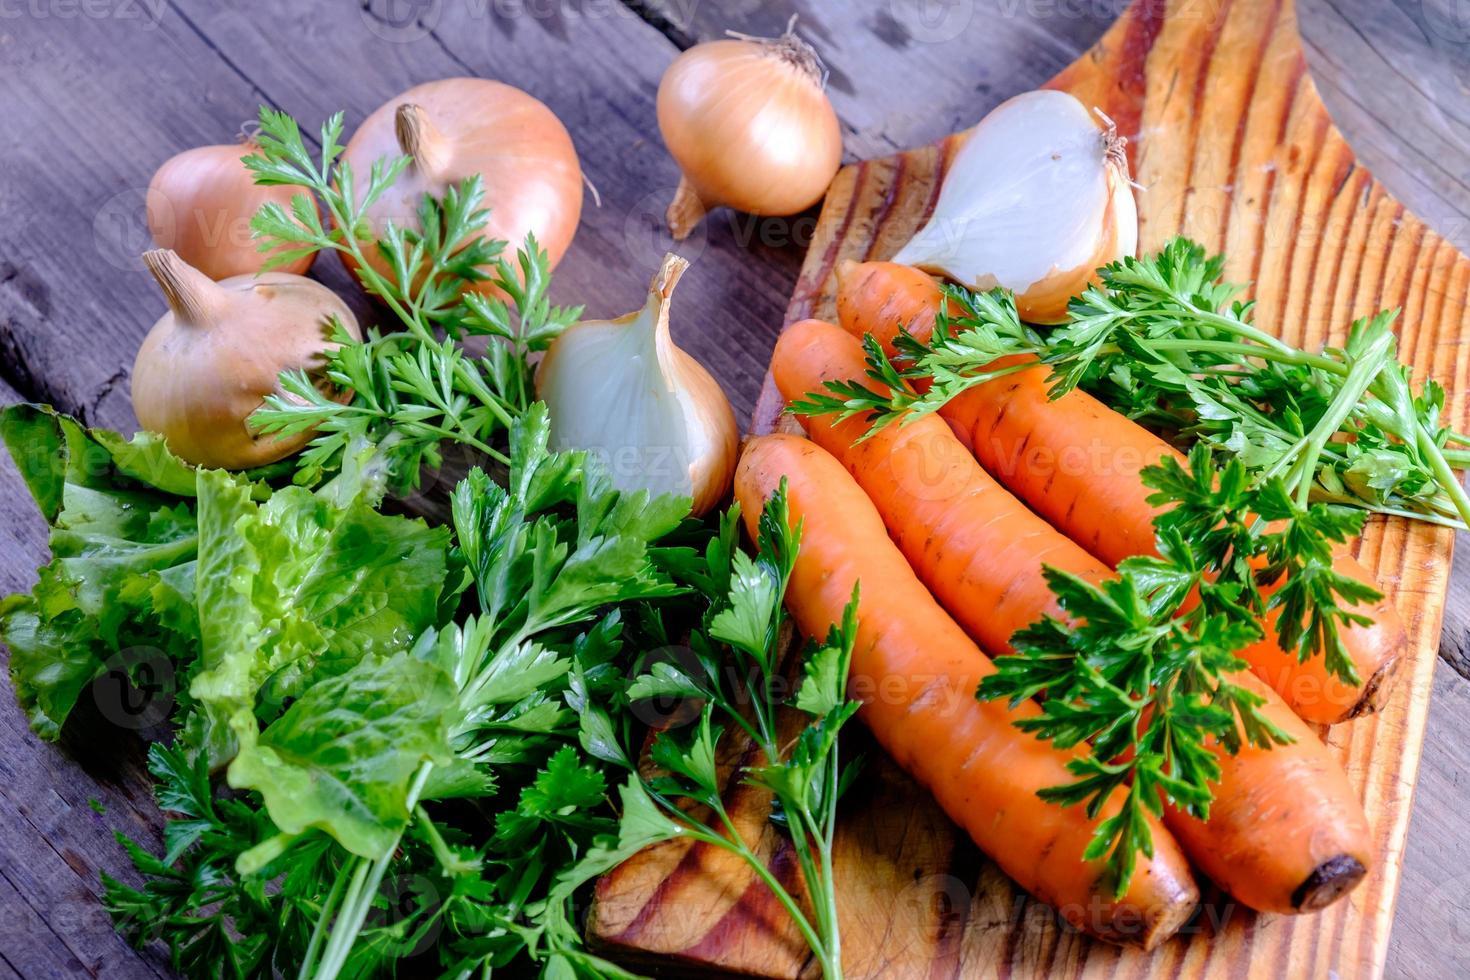 carrots and onion. Mixed healthy snacks